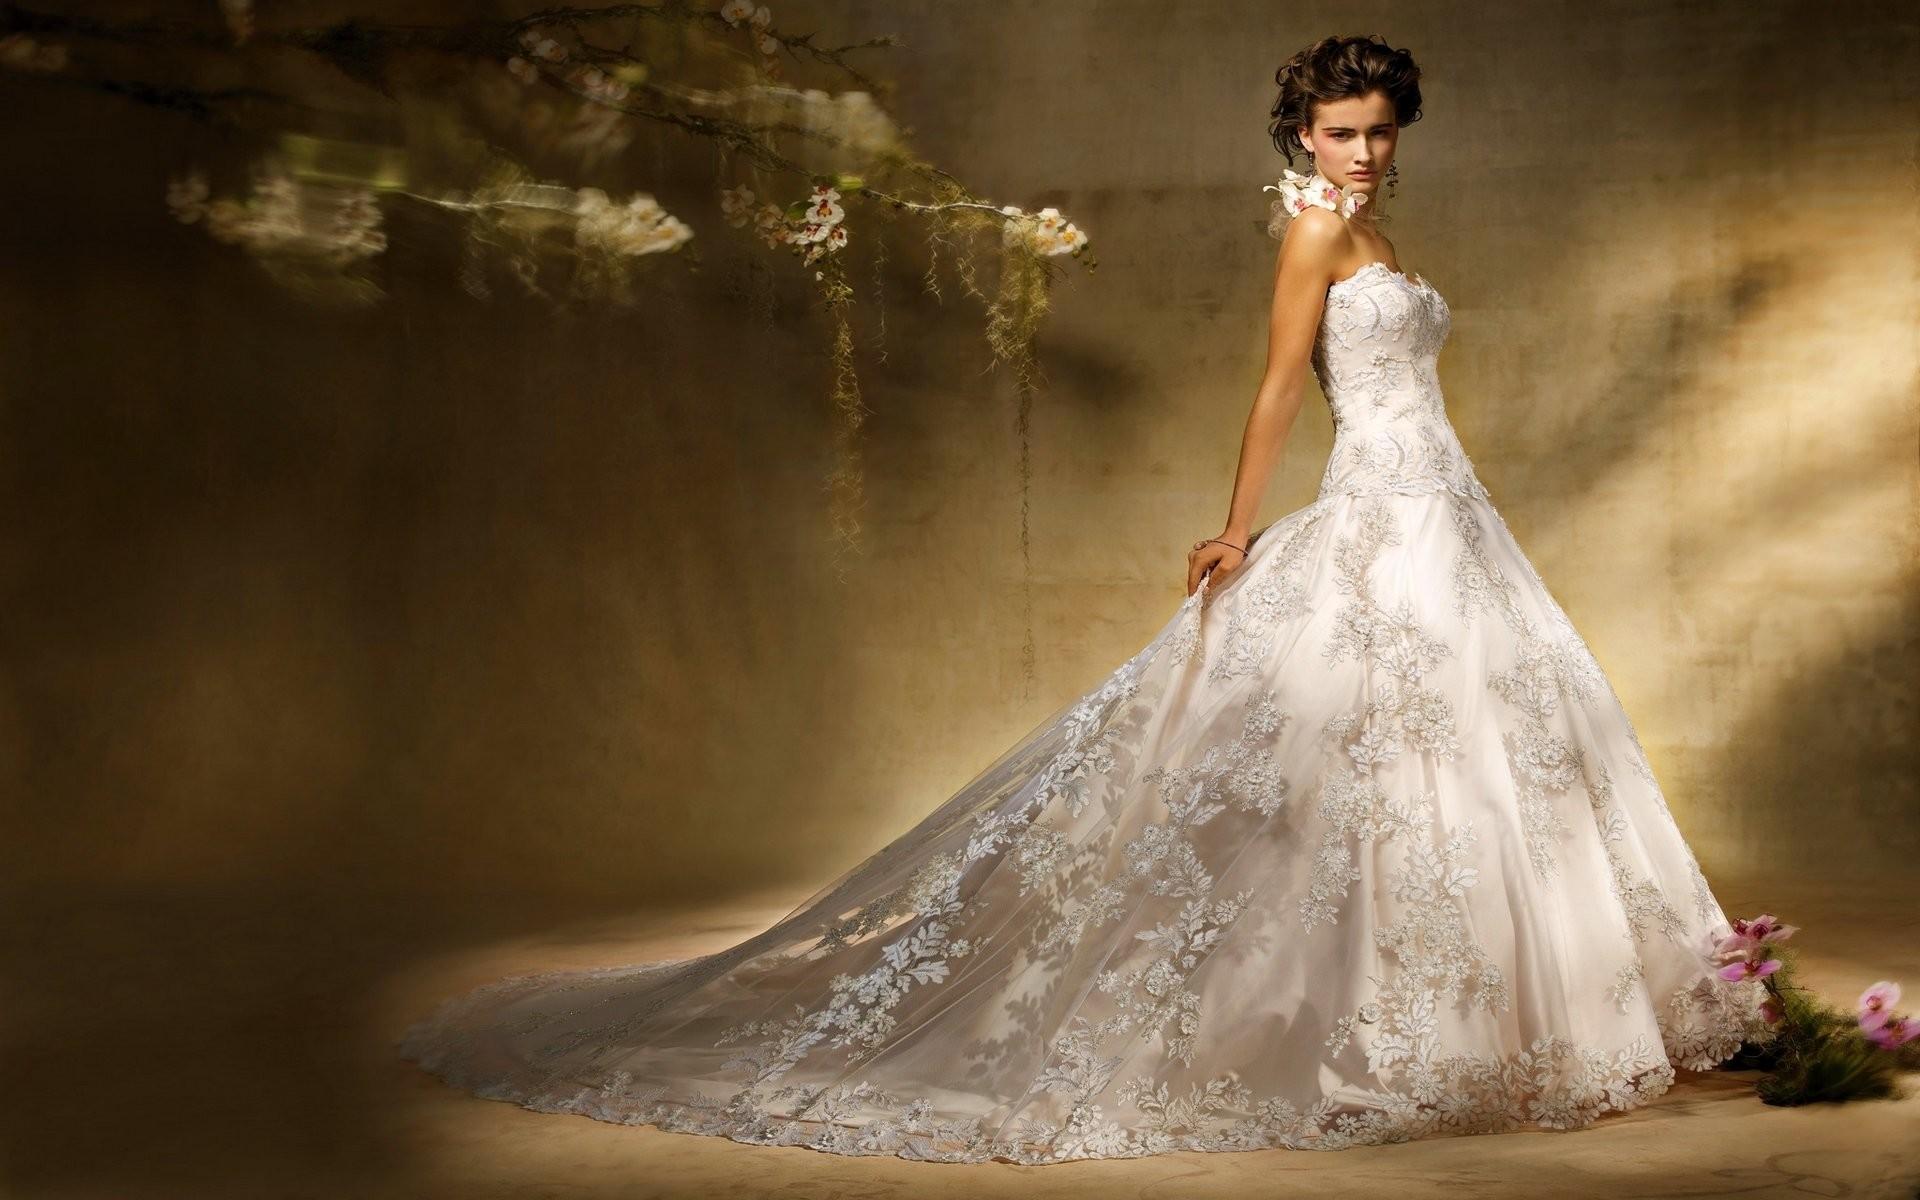 Wedding Dress Wallpaper 66 Images,Bridal Short Casual Beach Wedding Dresses